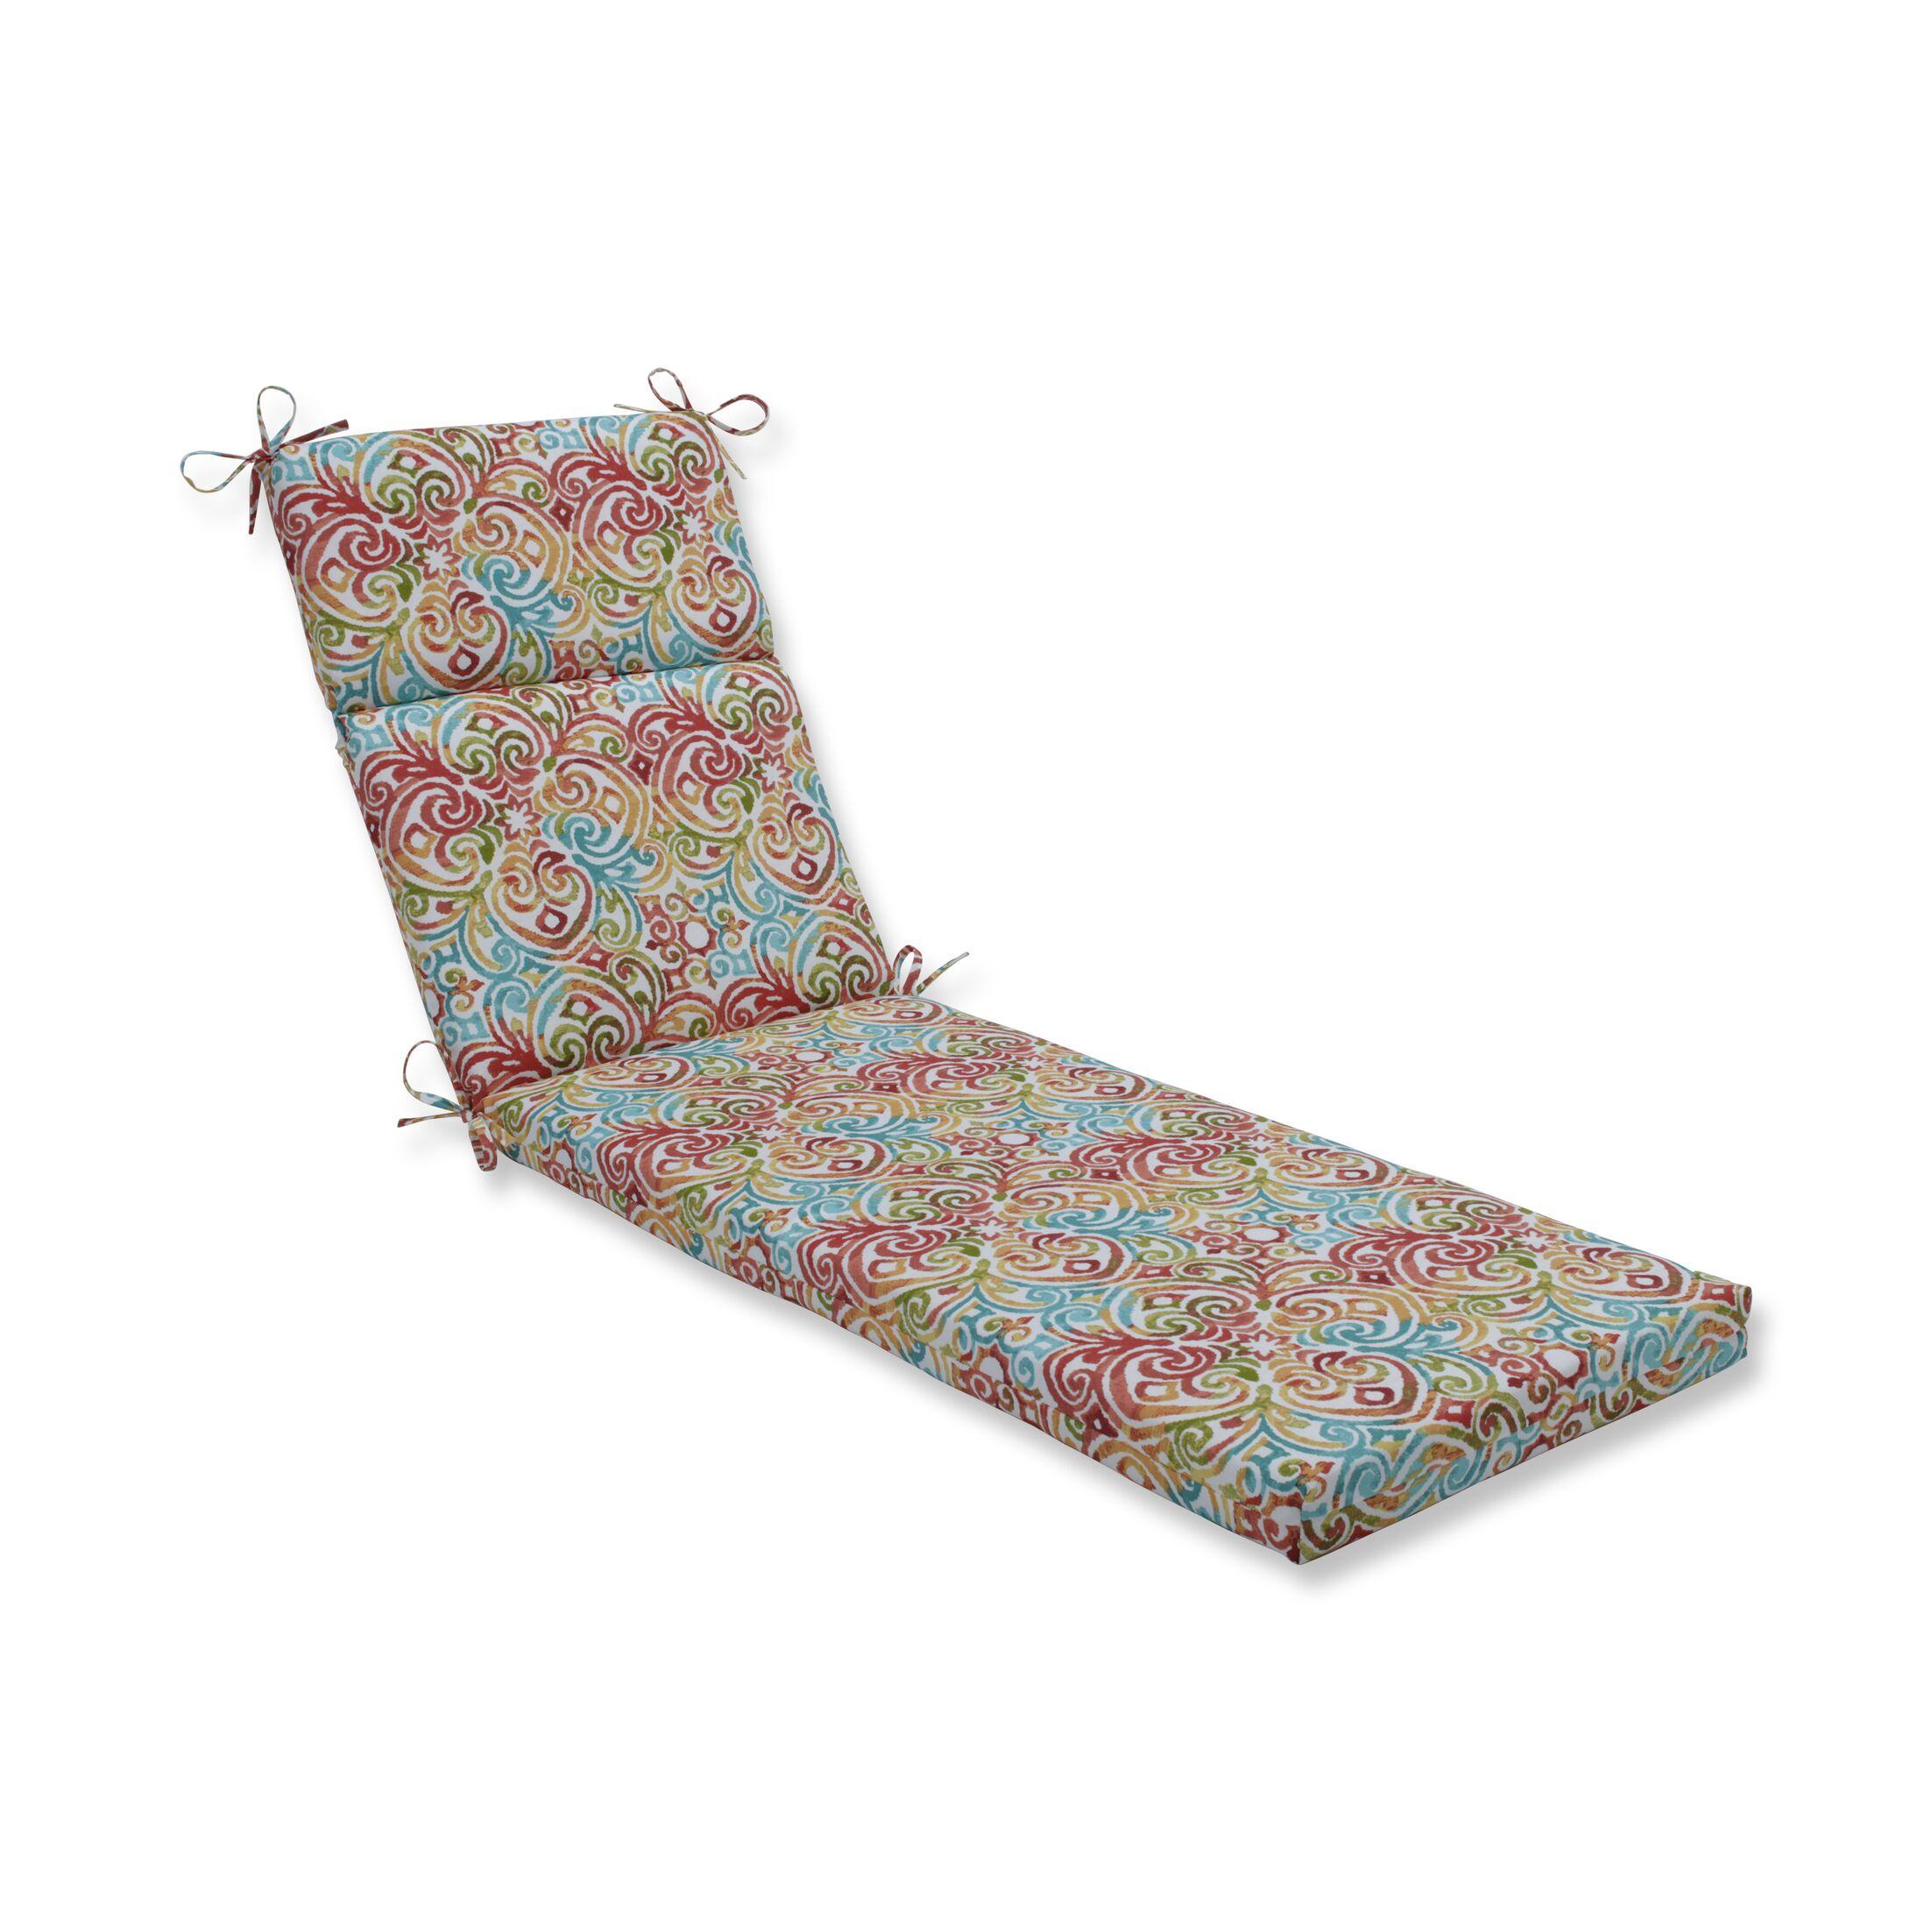 Corinthian Dapple Outdoor Chaise Lounge Cushion